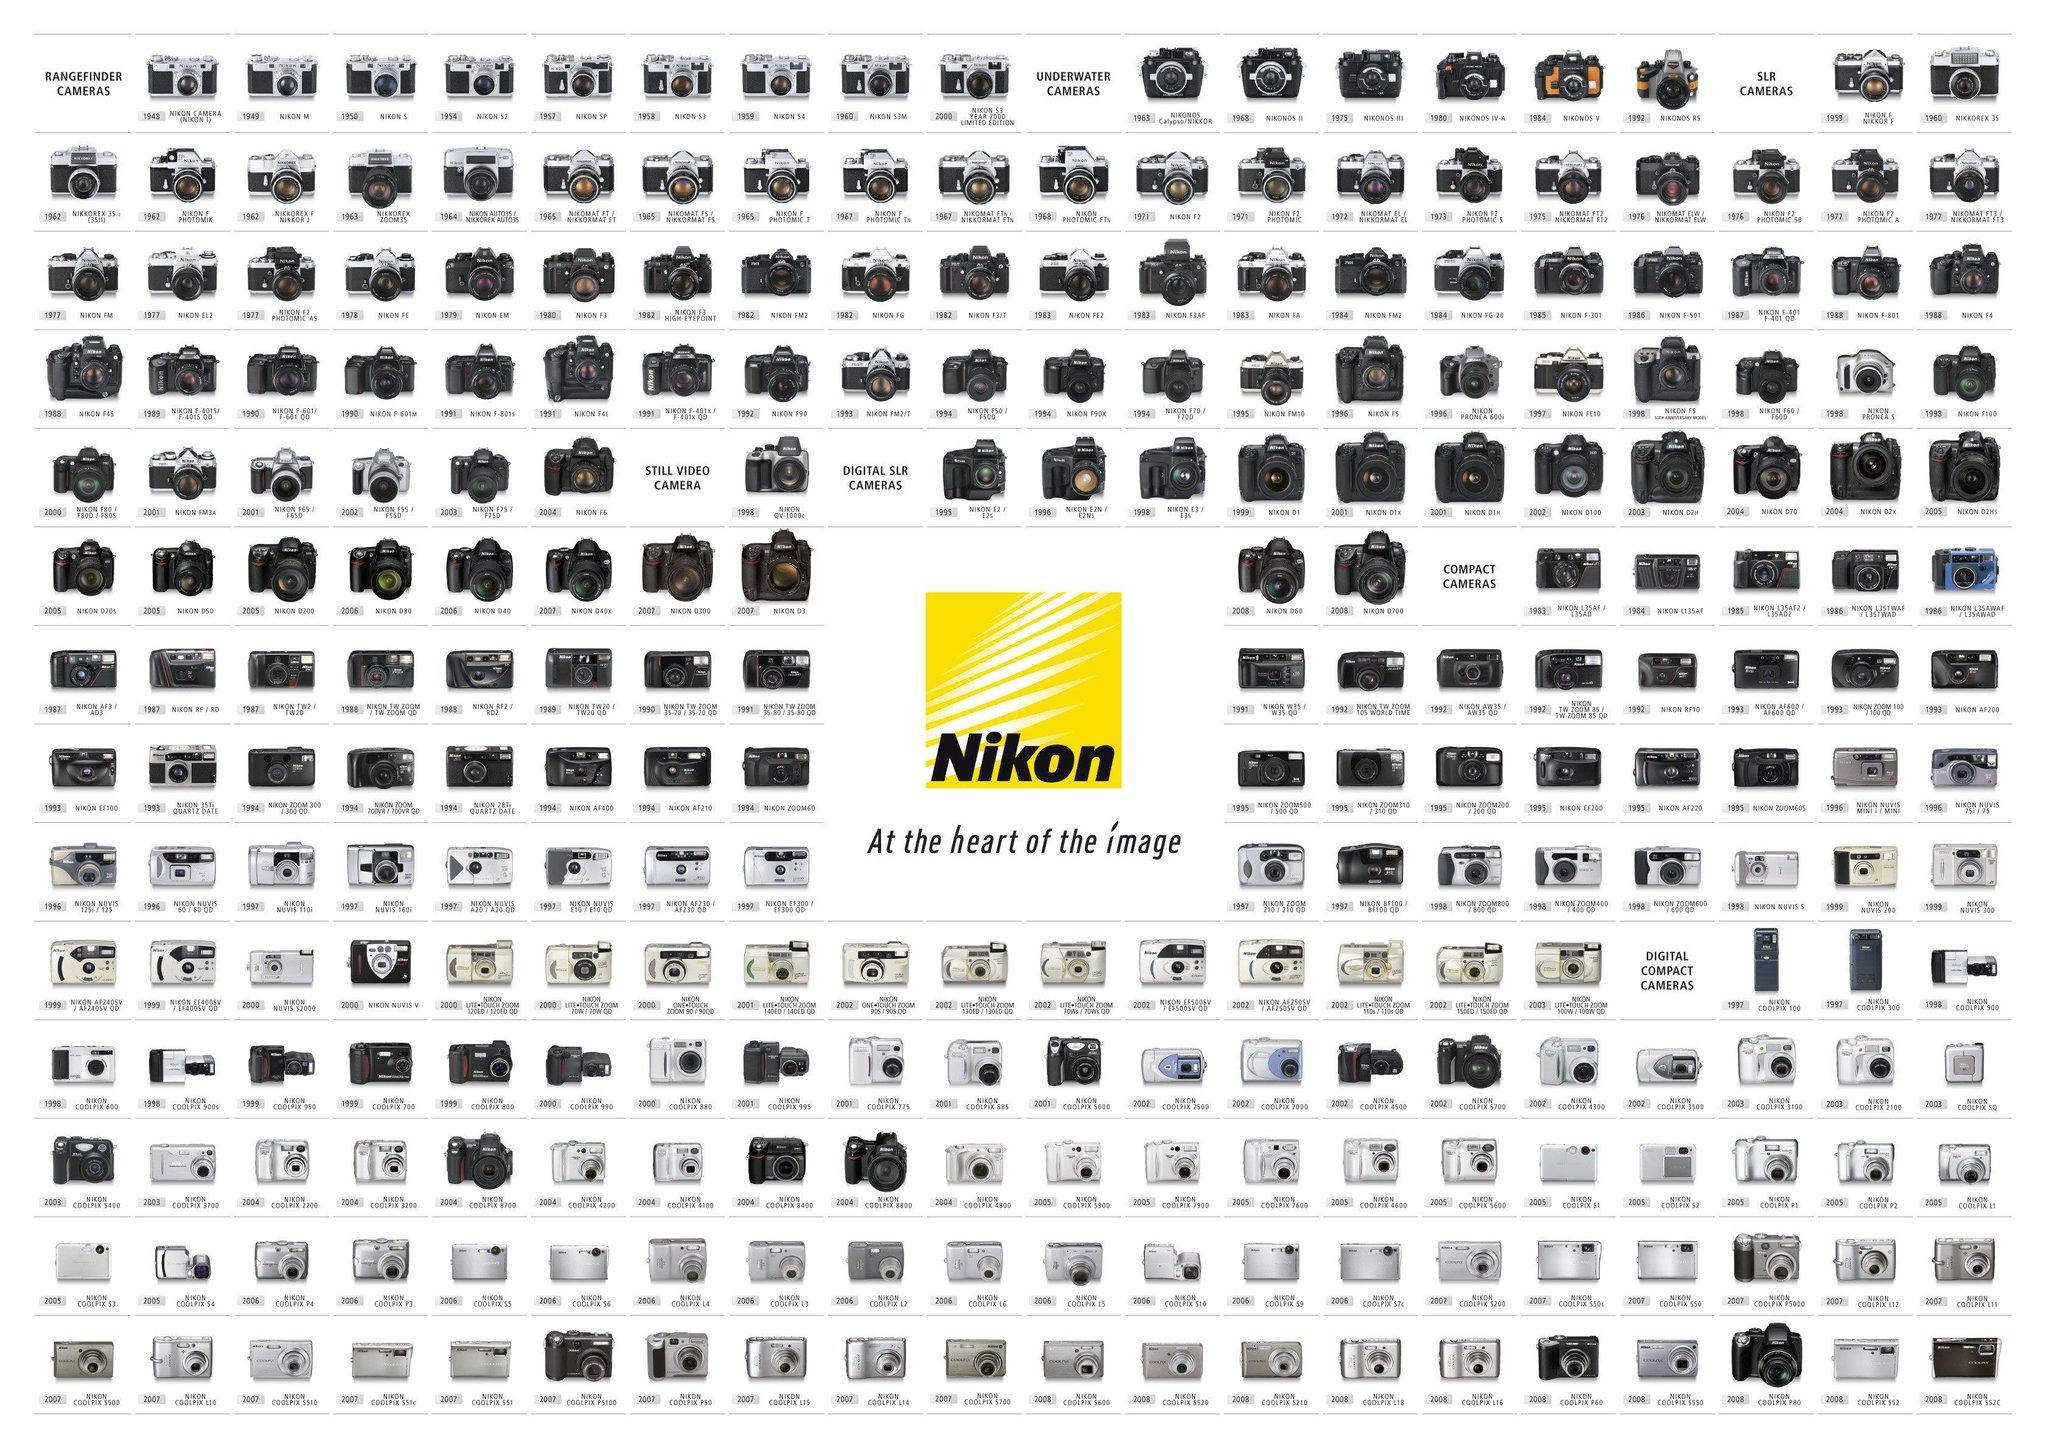 Nikon cameras over the years: http://t.co/VAVB19Hhbu